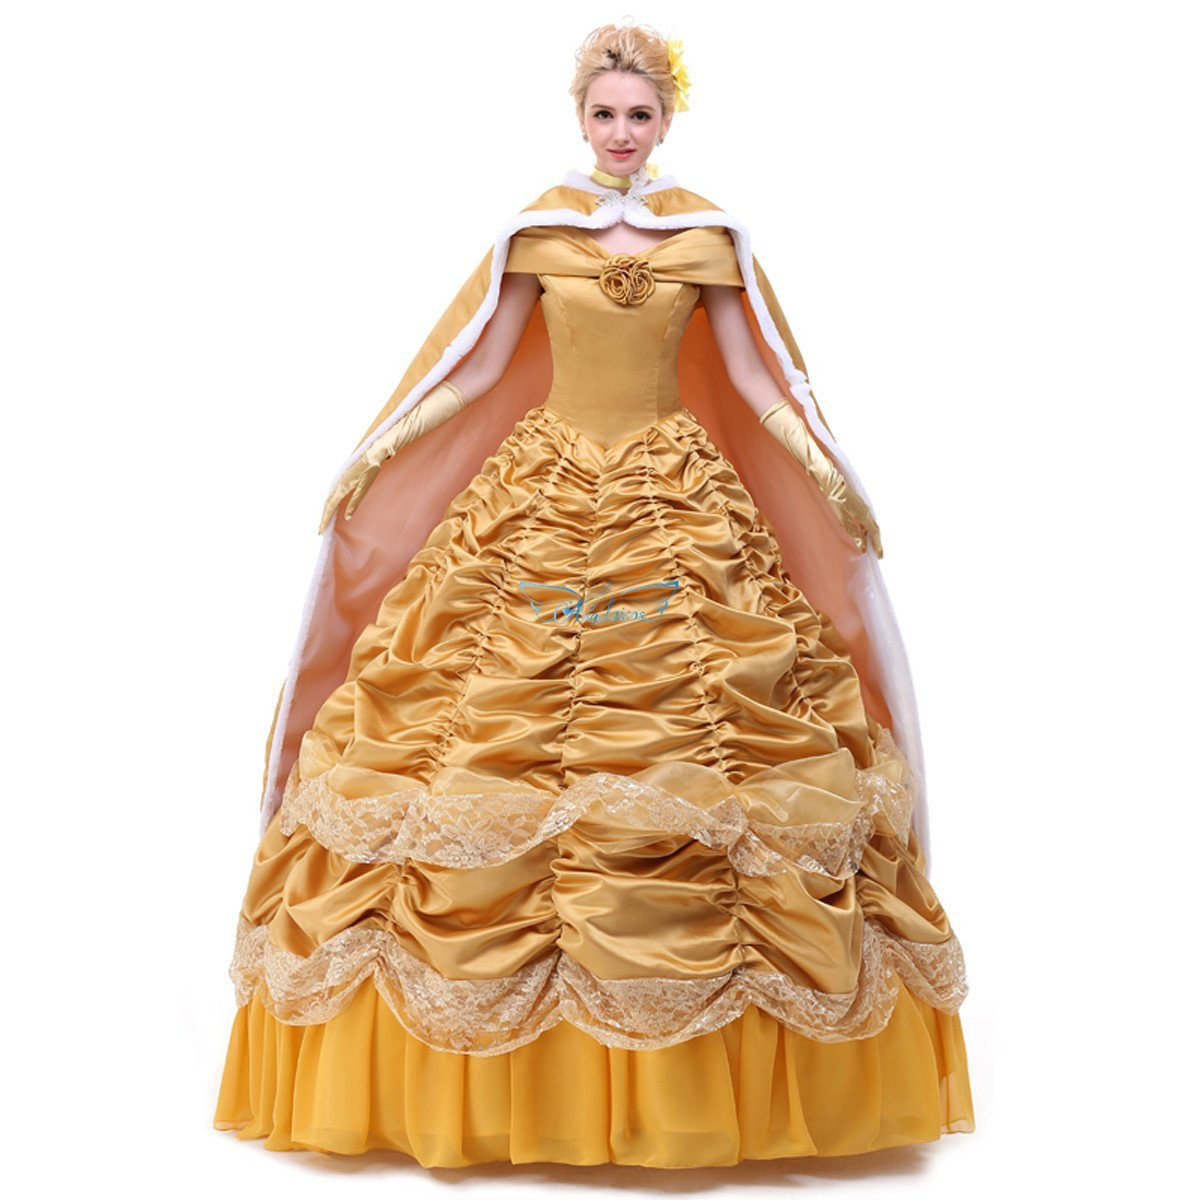 Angelaicos Womens Layered Prom Dresses Palace Queen Costume Cloak Petticoat (S, Satin Golden)